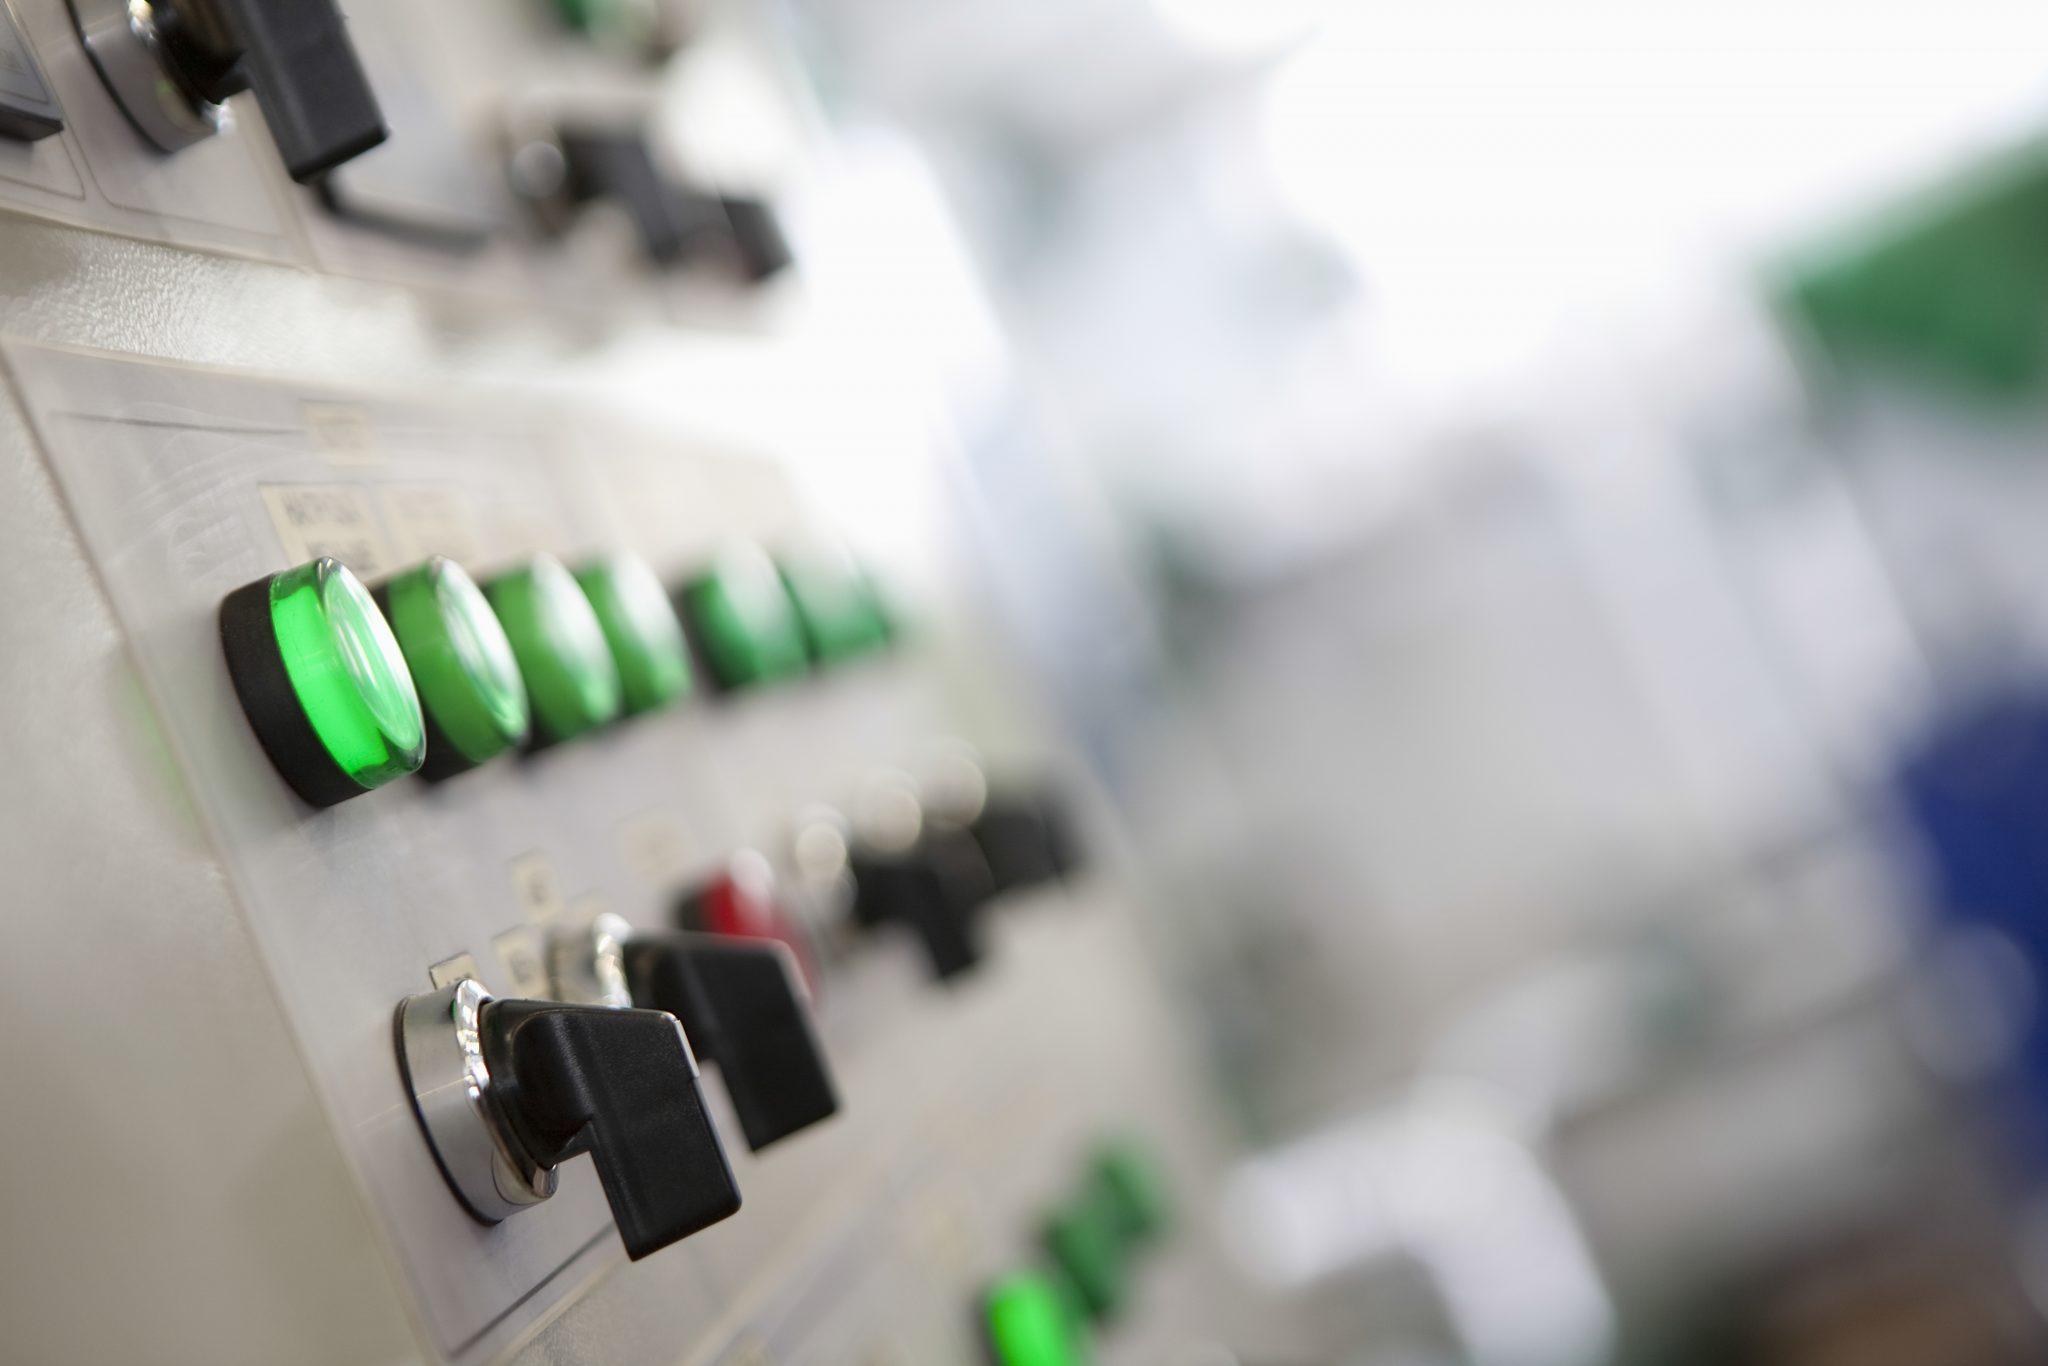 SMA POWER CONTROLS PVT. LTD